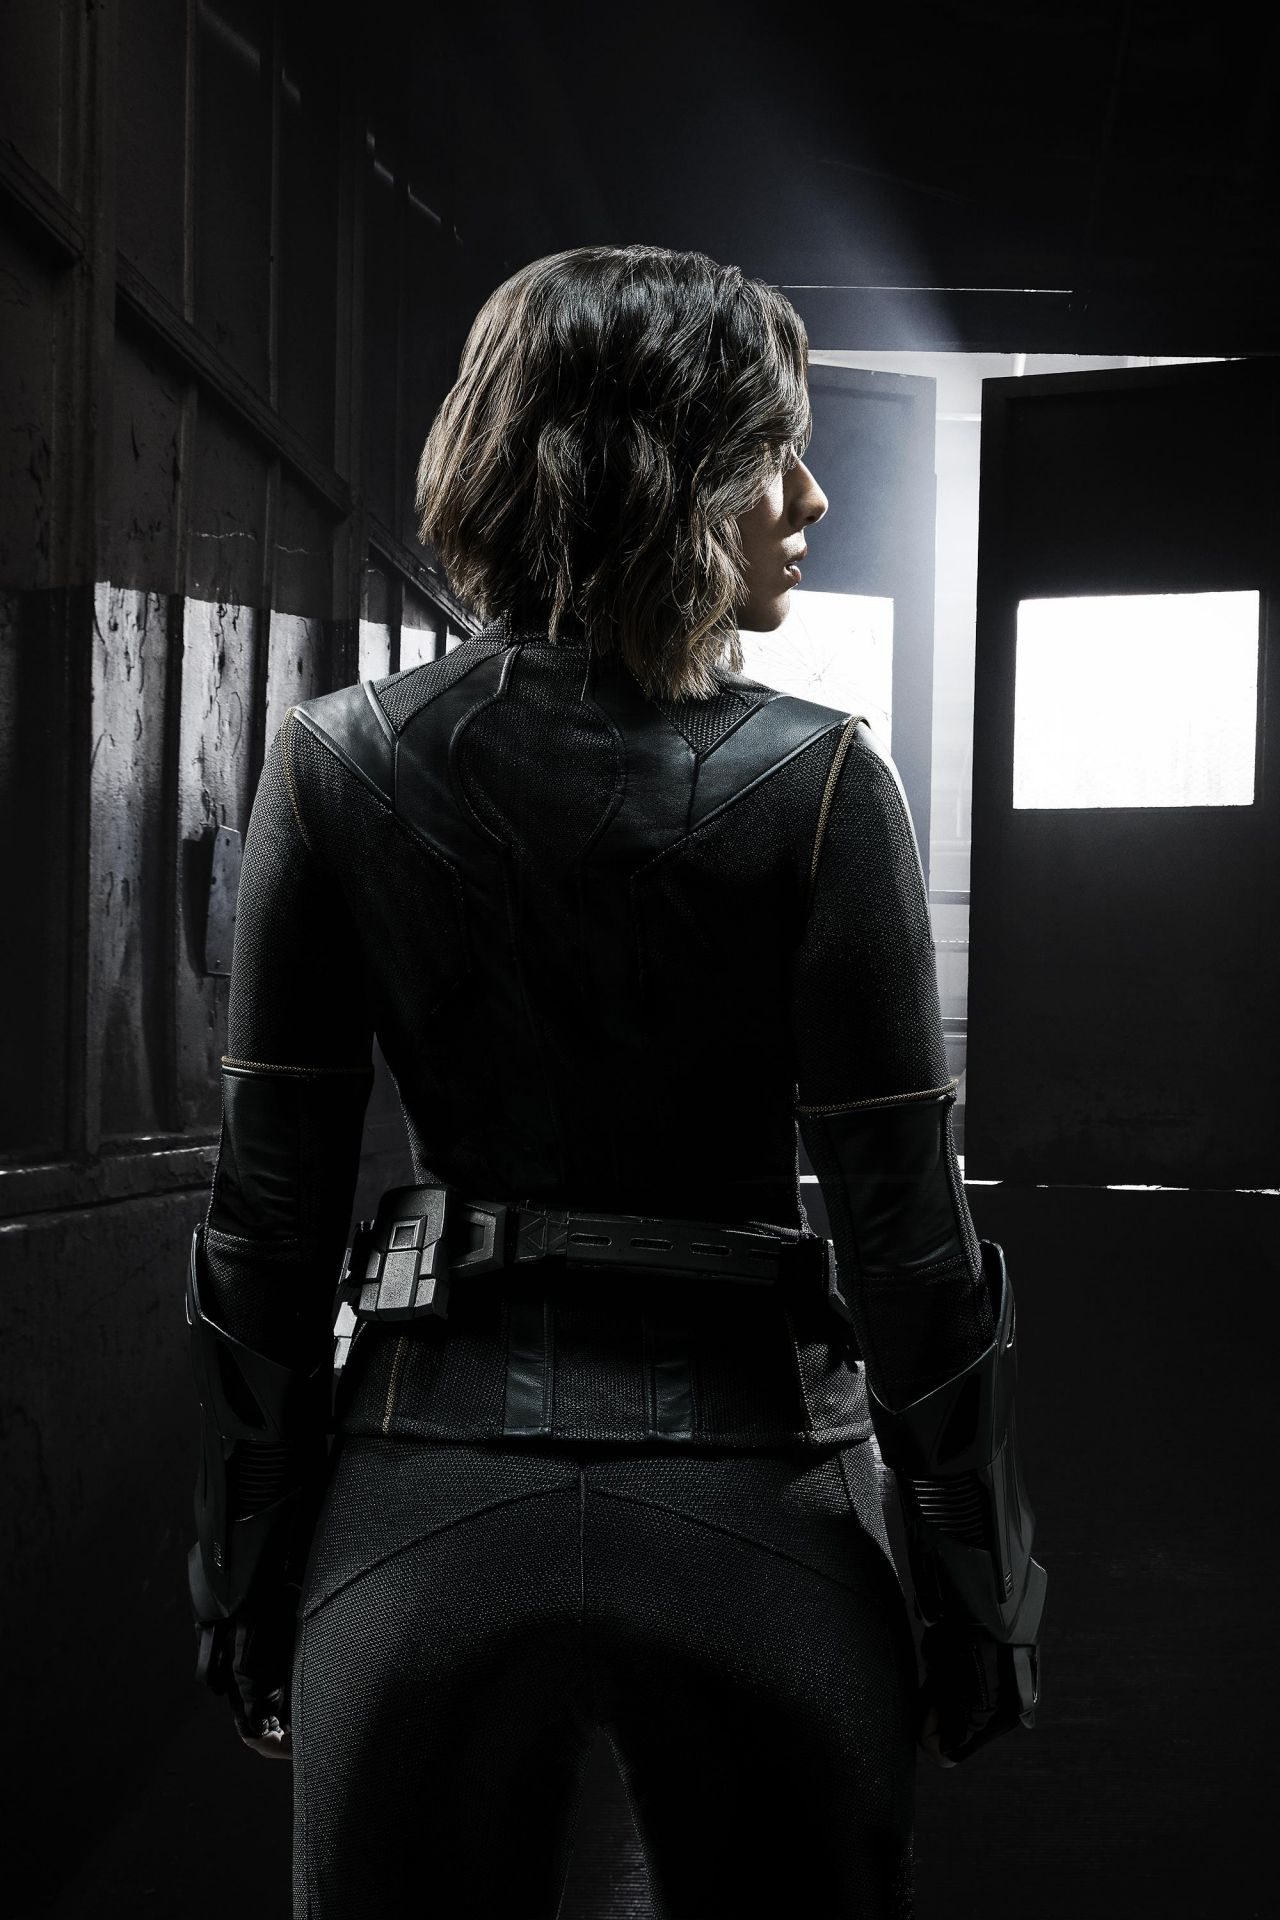 Chloe bennet agents of shield s3 e03 e1112